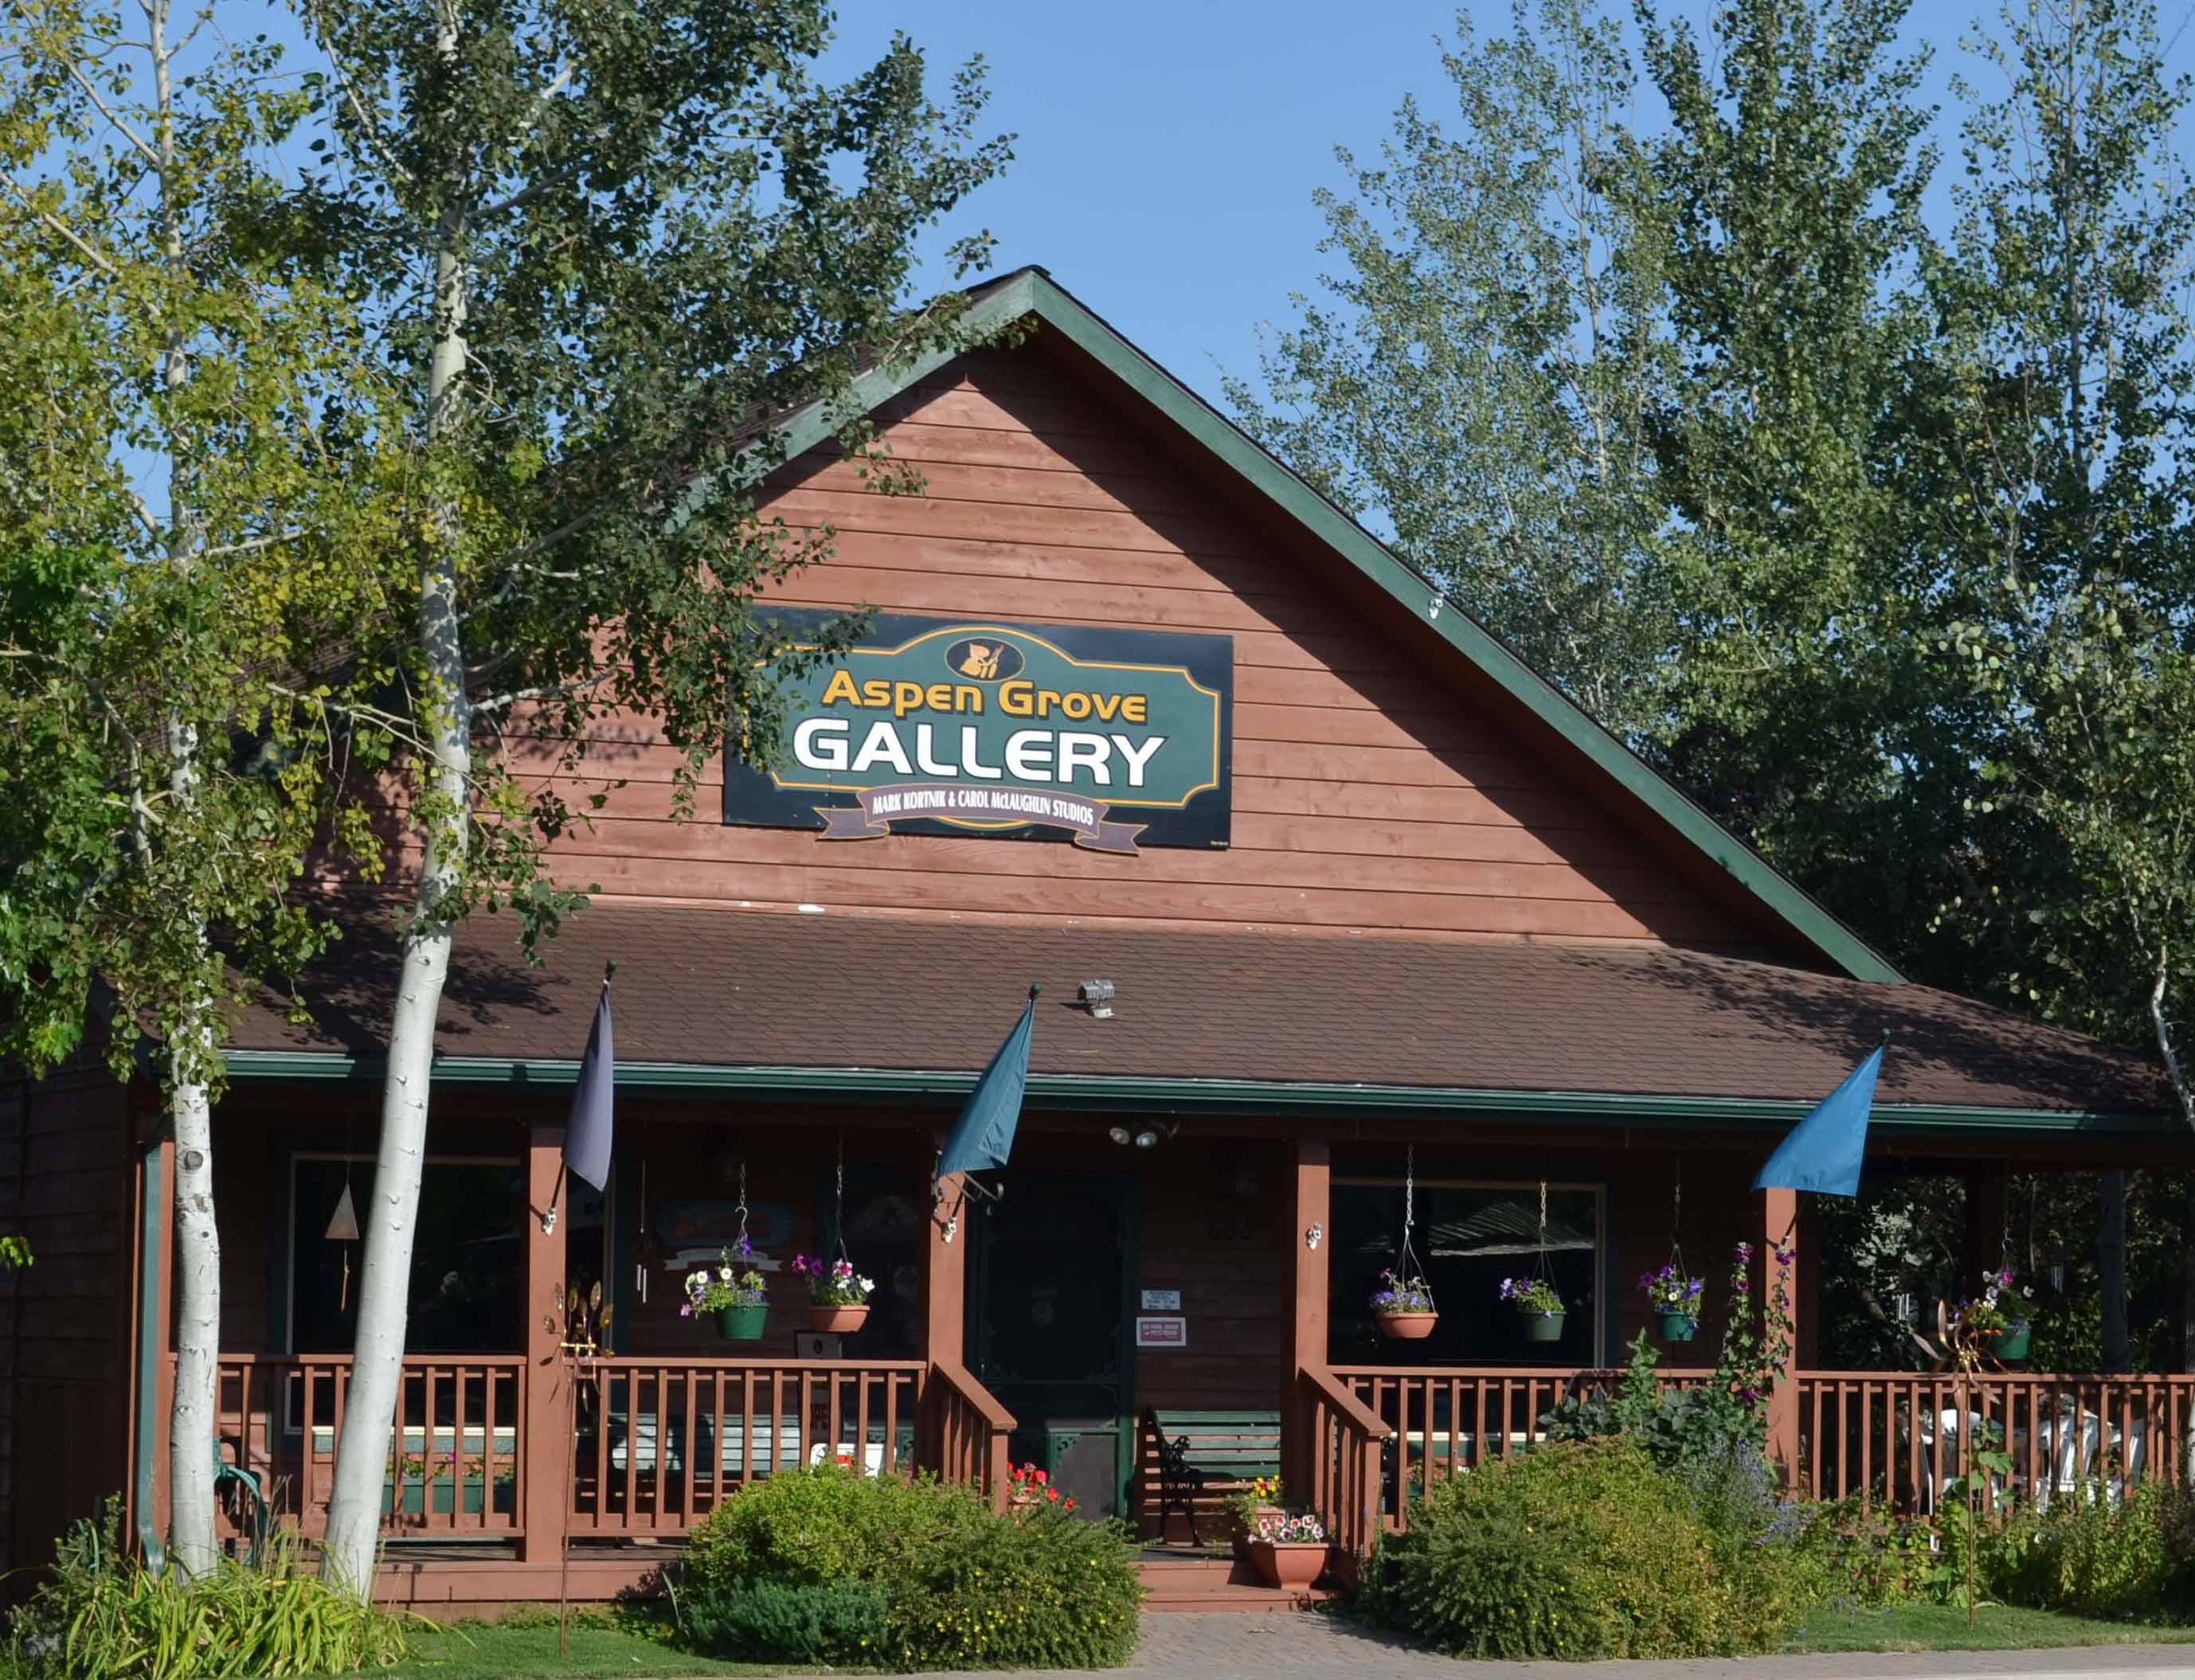 Aspen Grove Gallery in Joseph